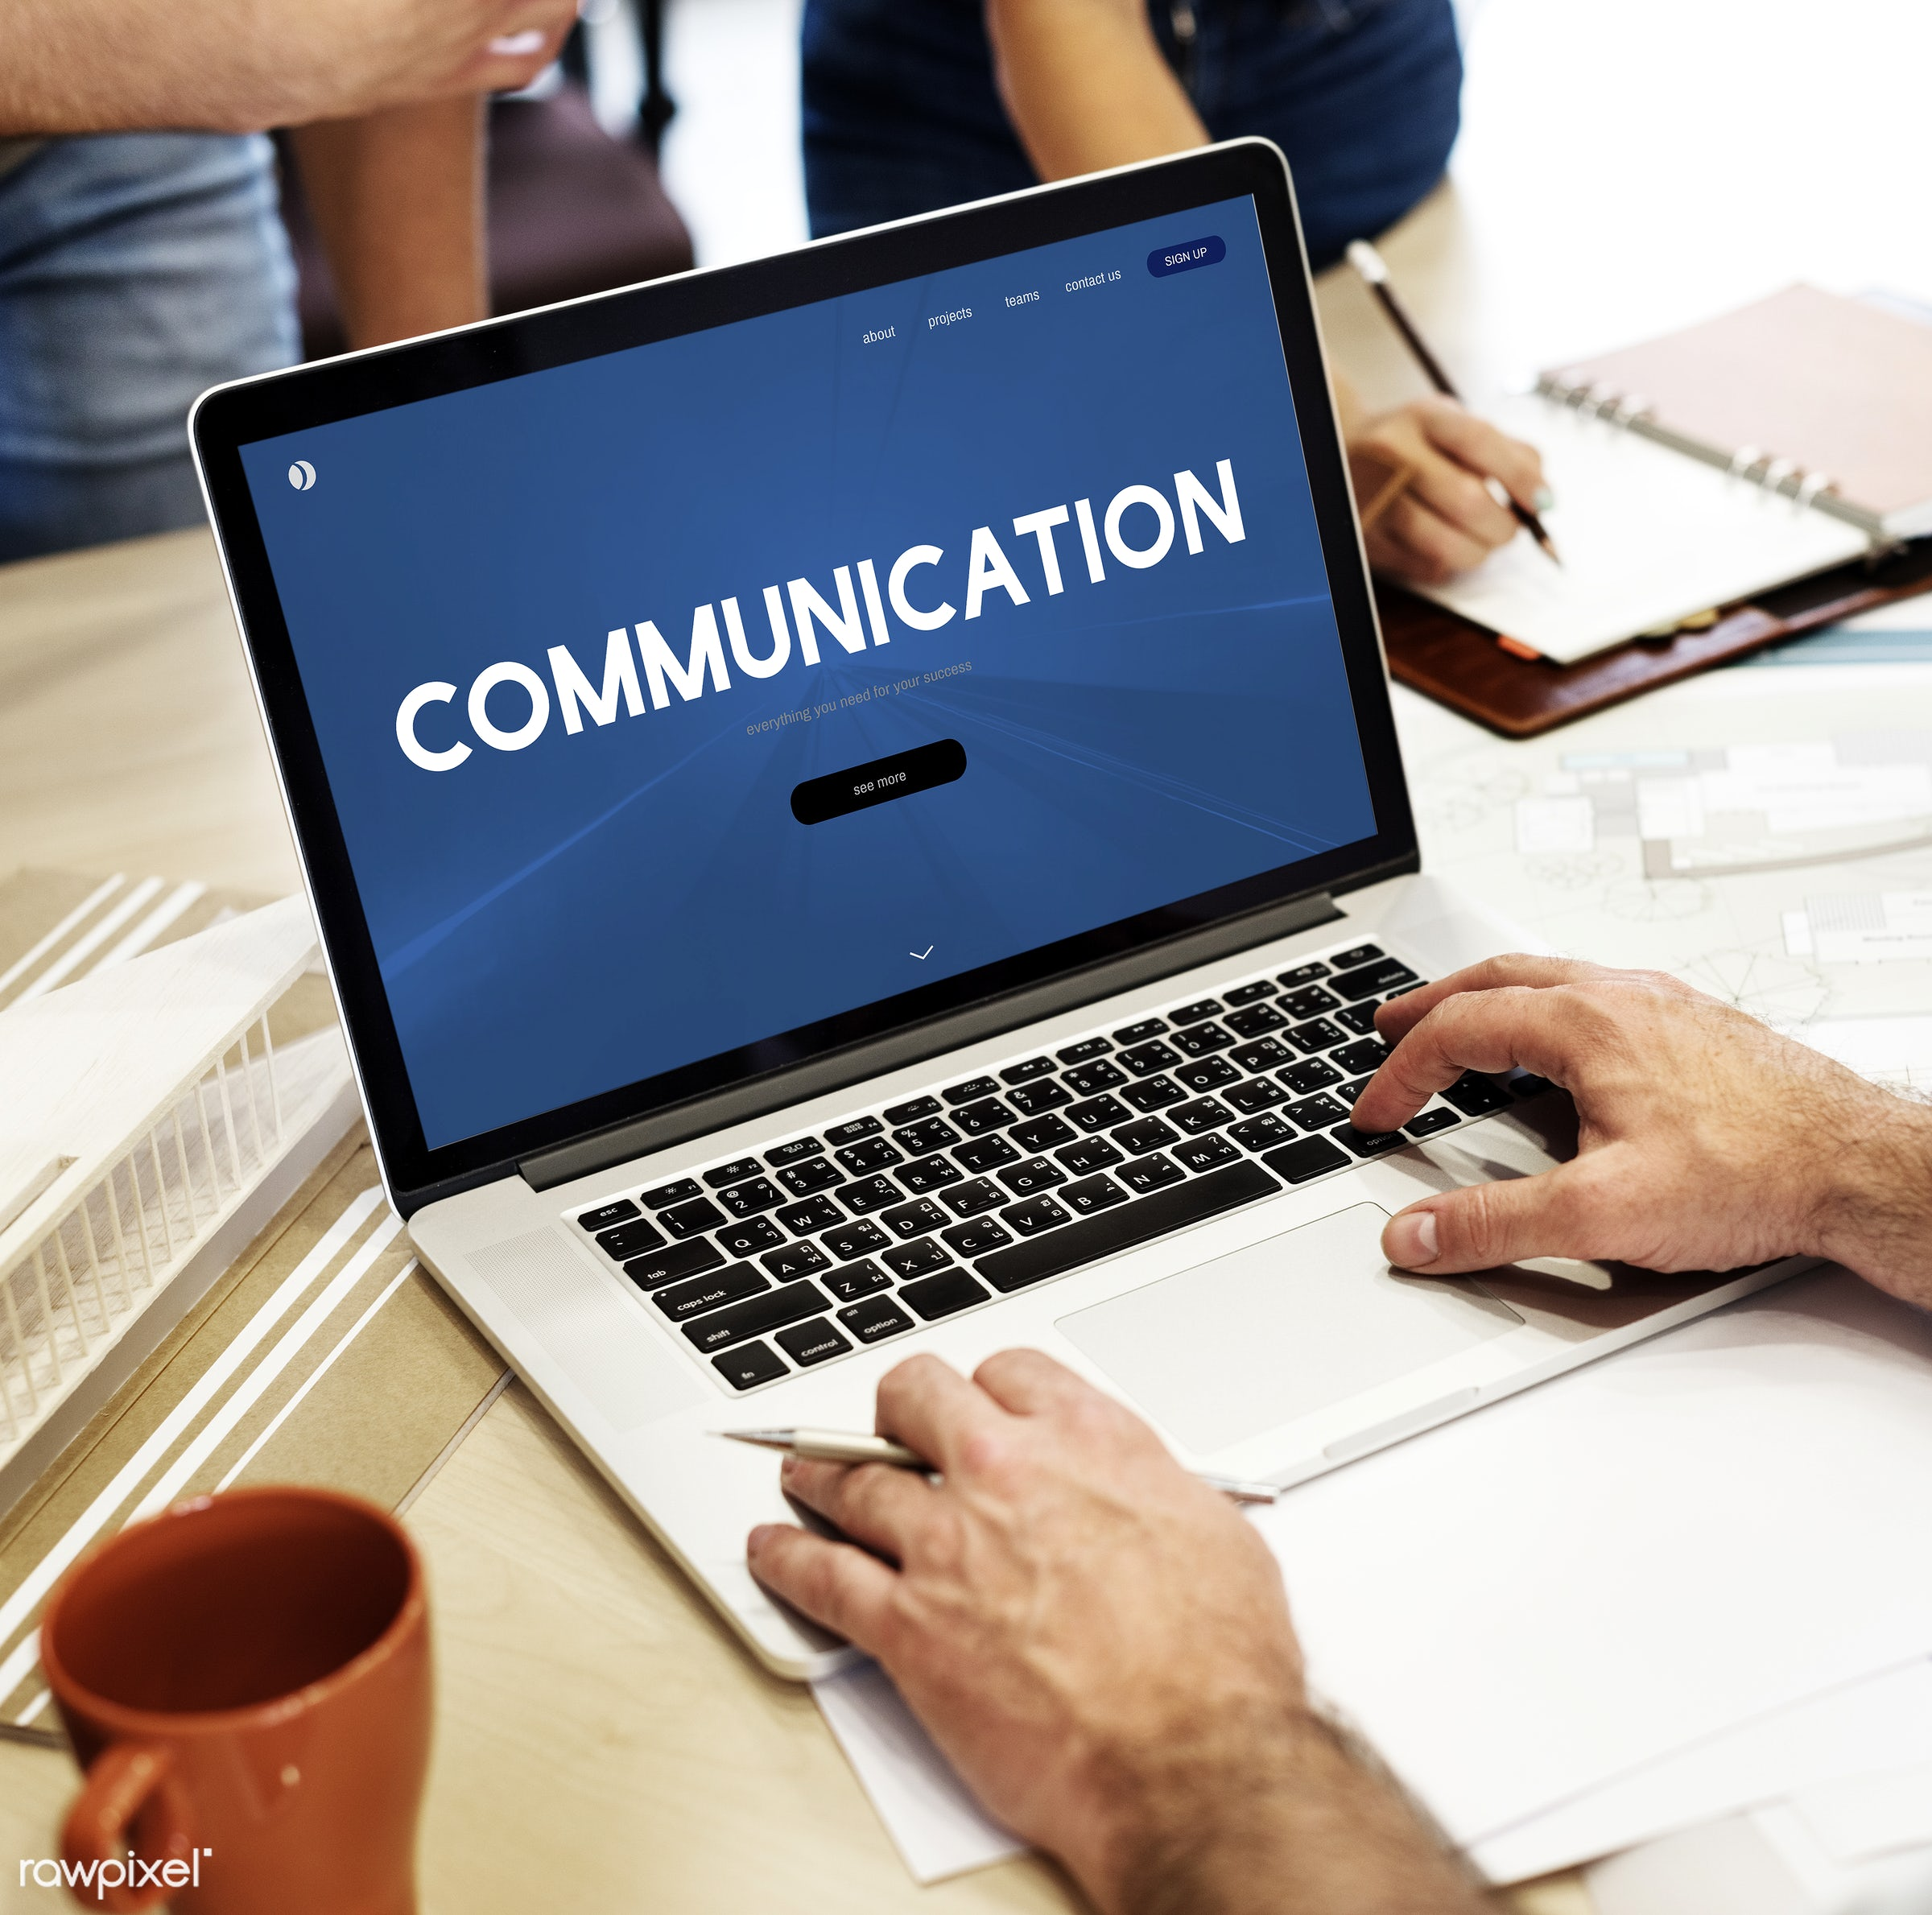 architect, architecture, art, blueprint, coffee, coffee cup, communicate, communication, connect, connection, conversation,...